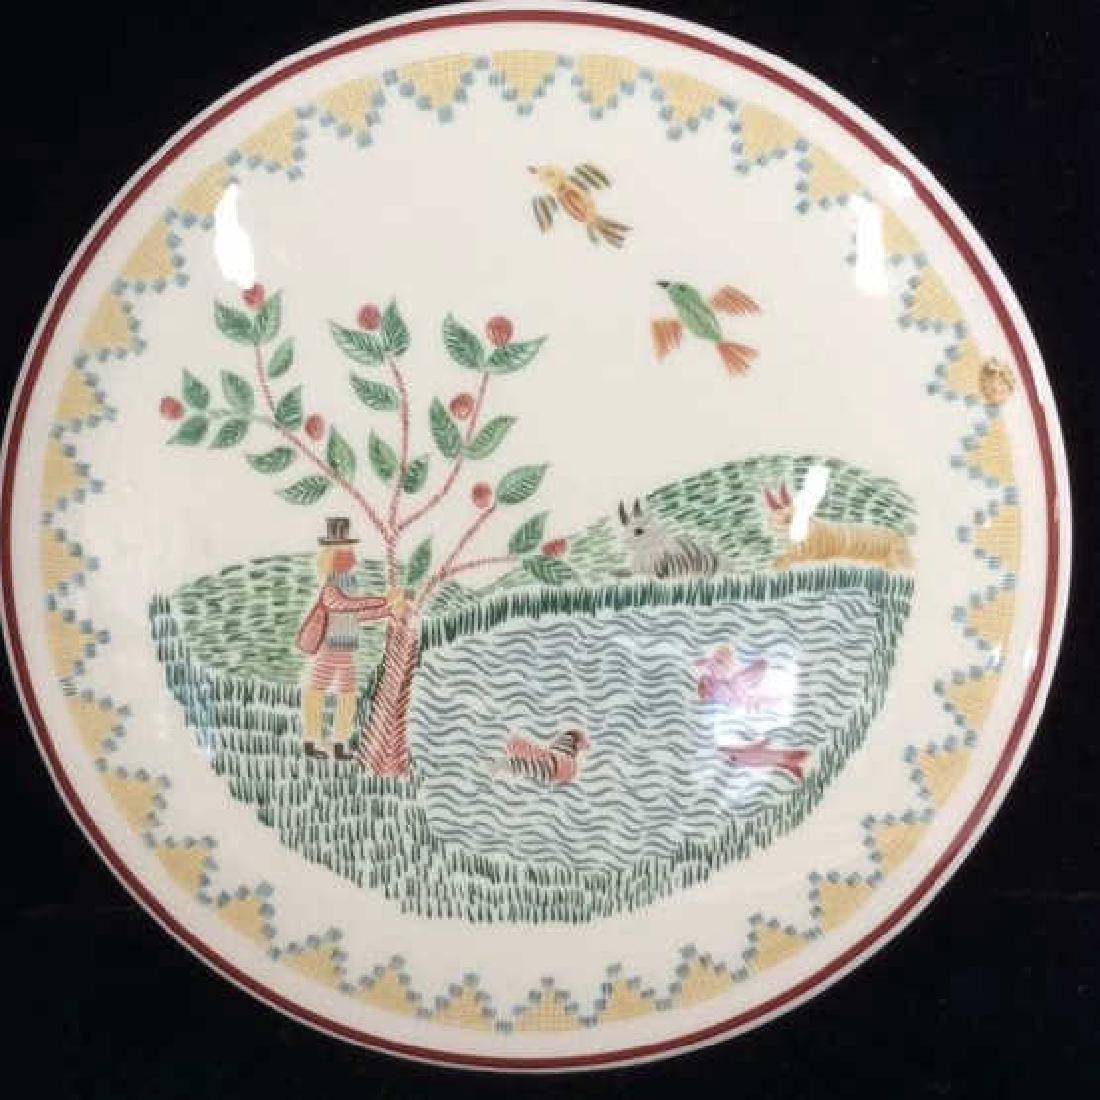 Porcelain Villeroy 7 Boch Dish W Lid - 2